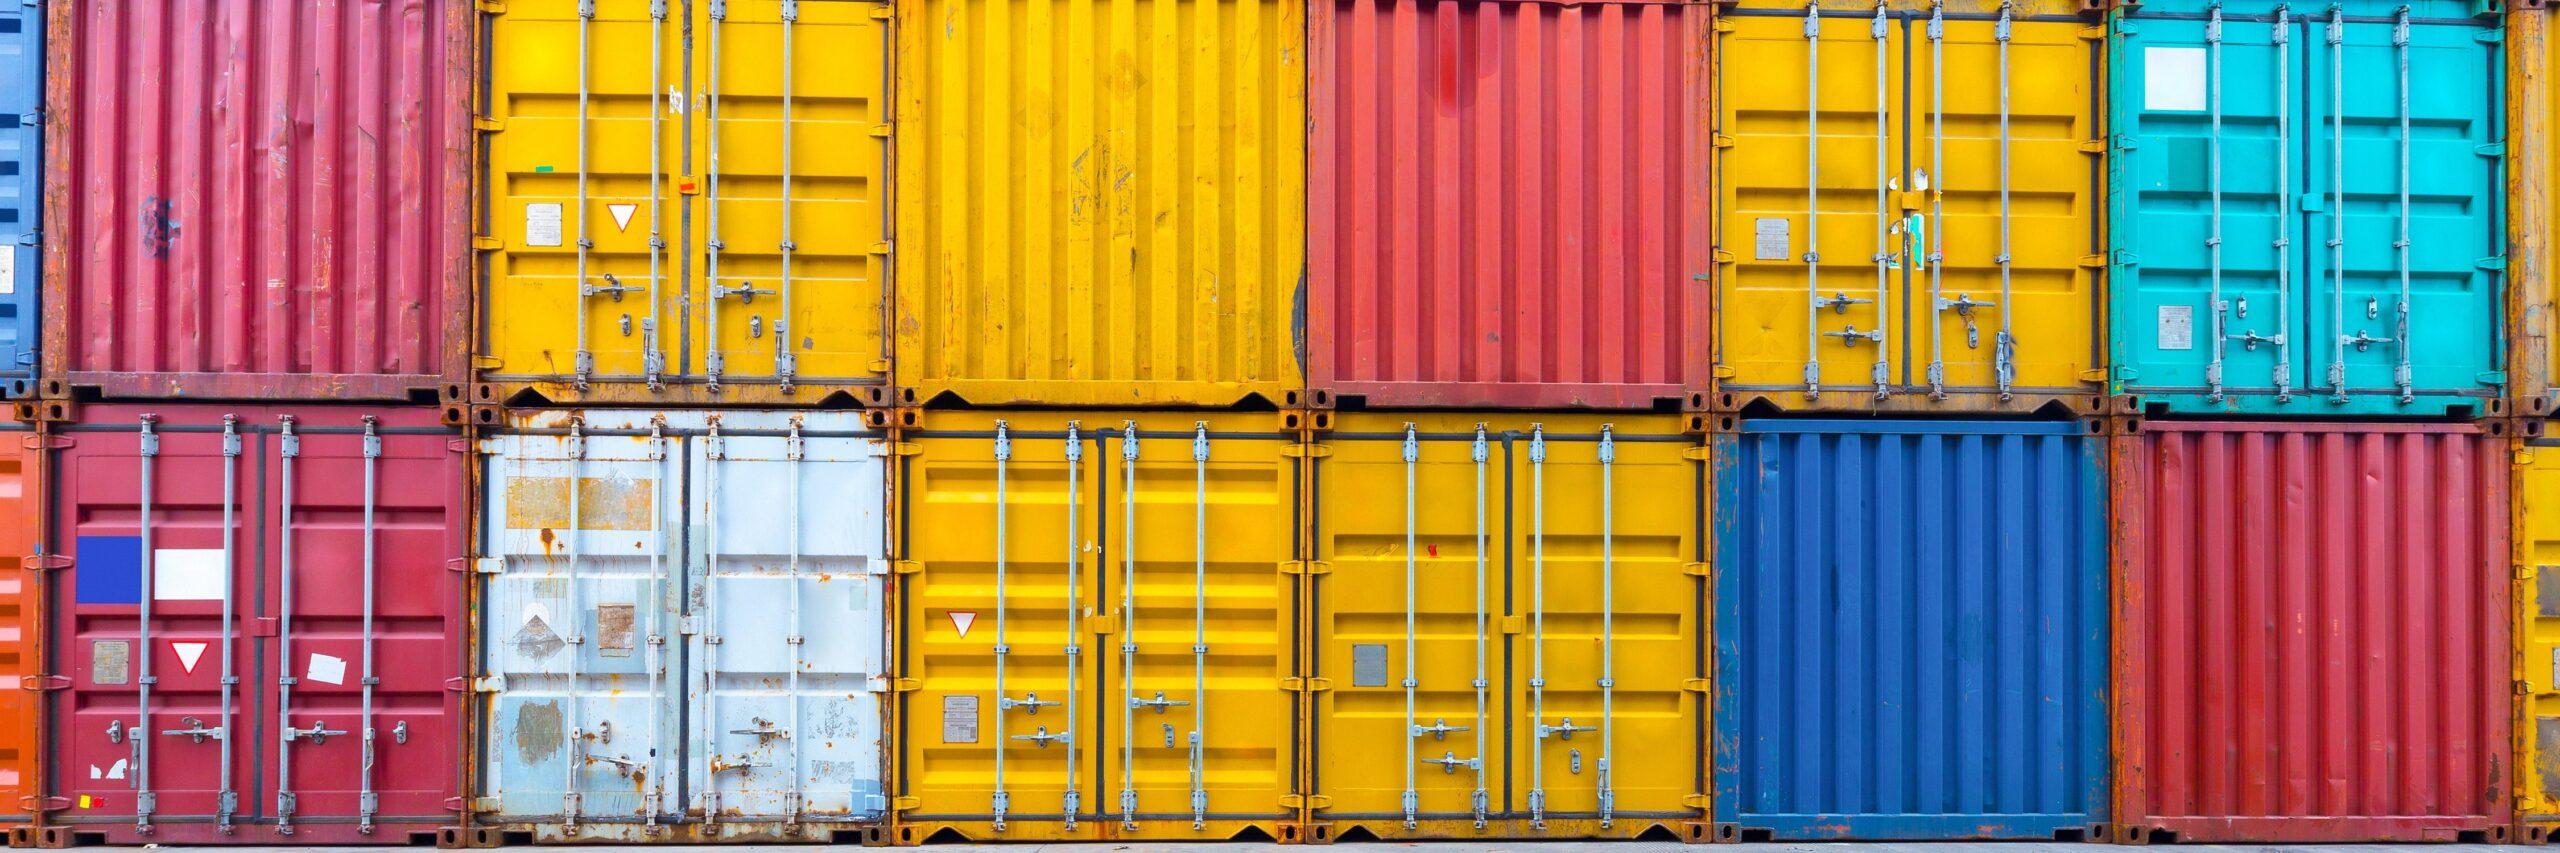 docker_container_fotolia.jpg